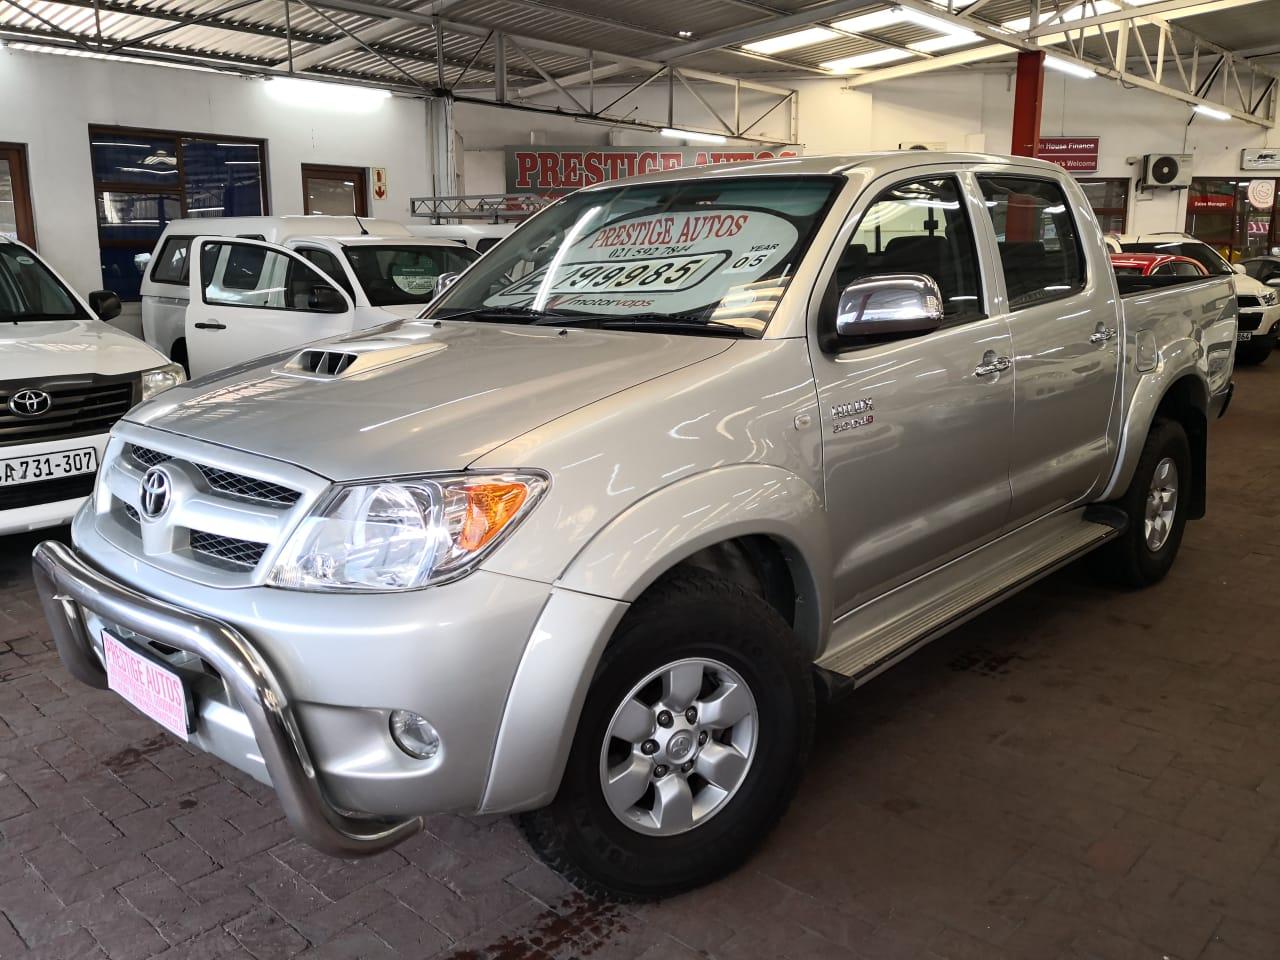 Kelebihan Toyota Hilux 2005 Harga